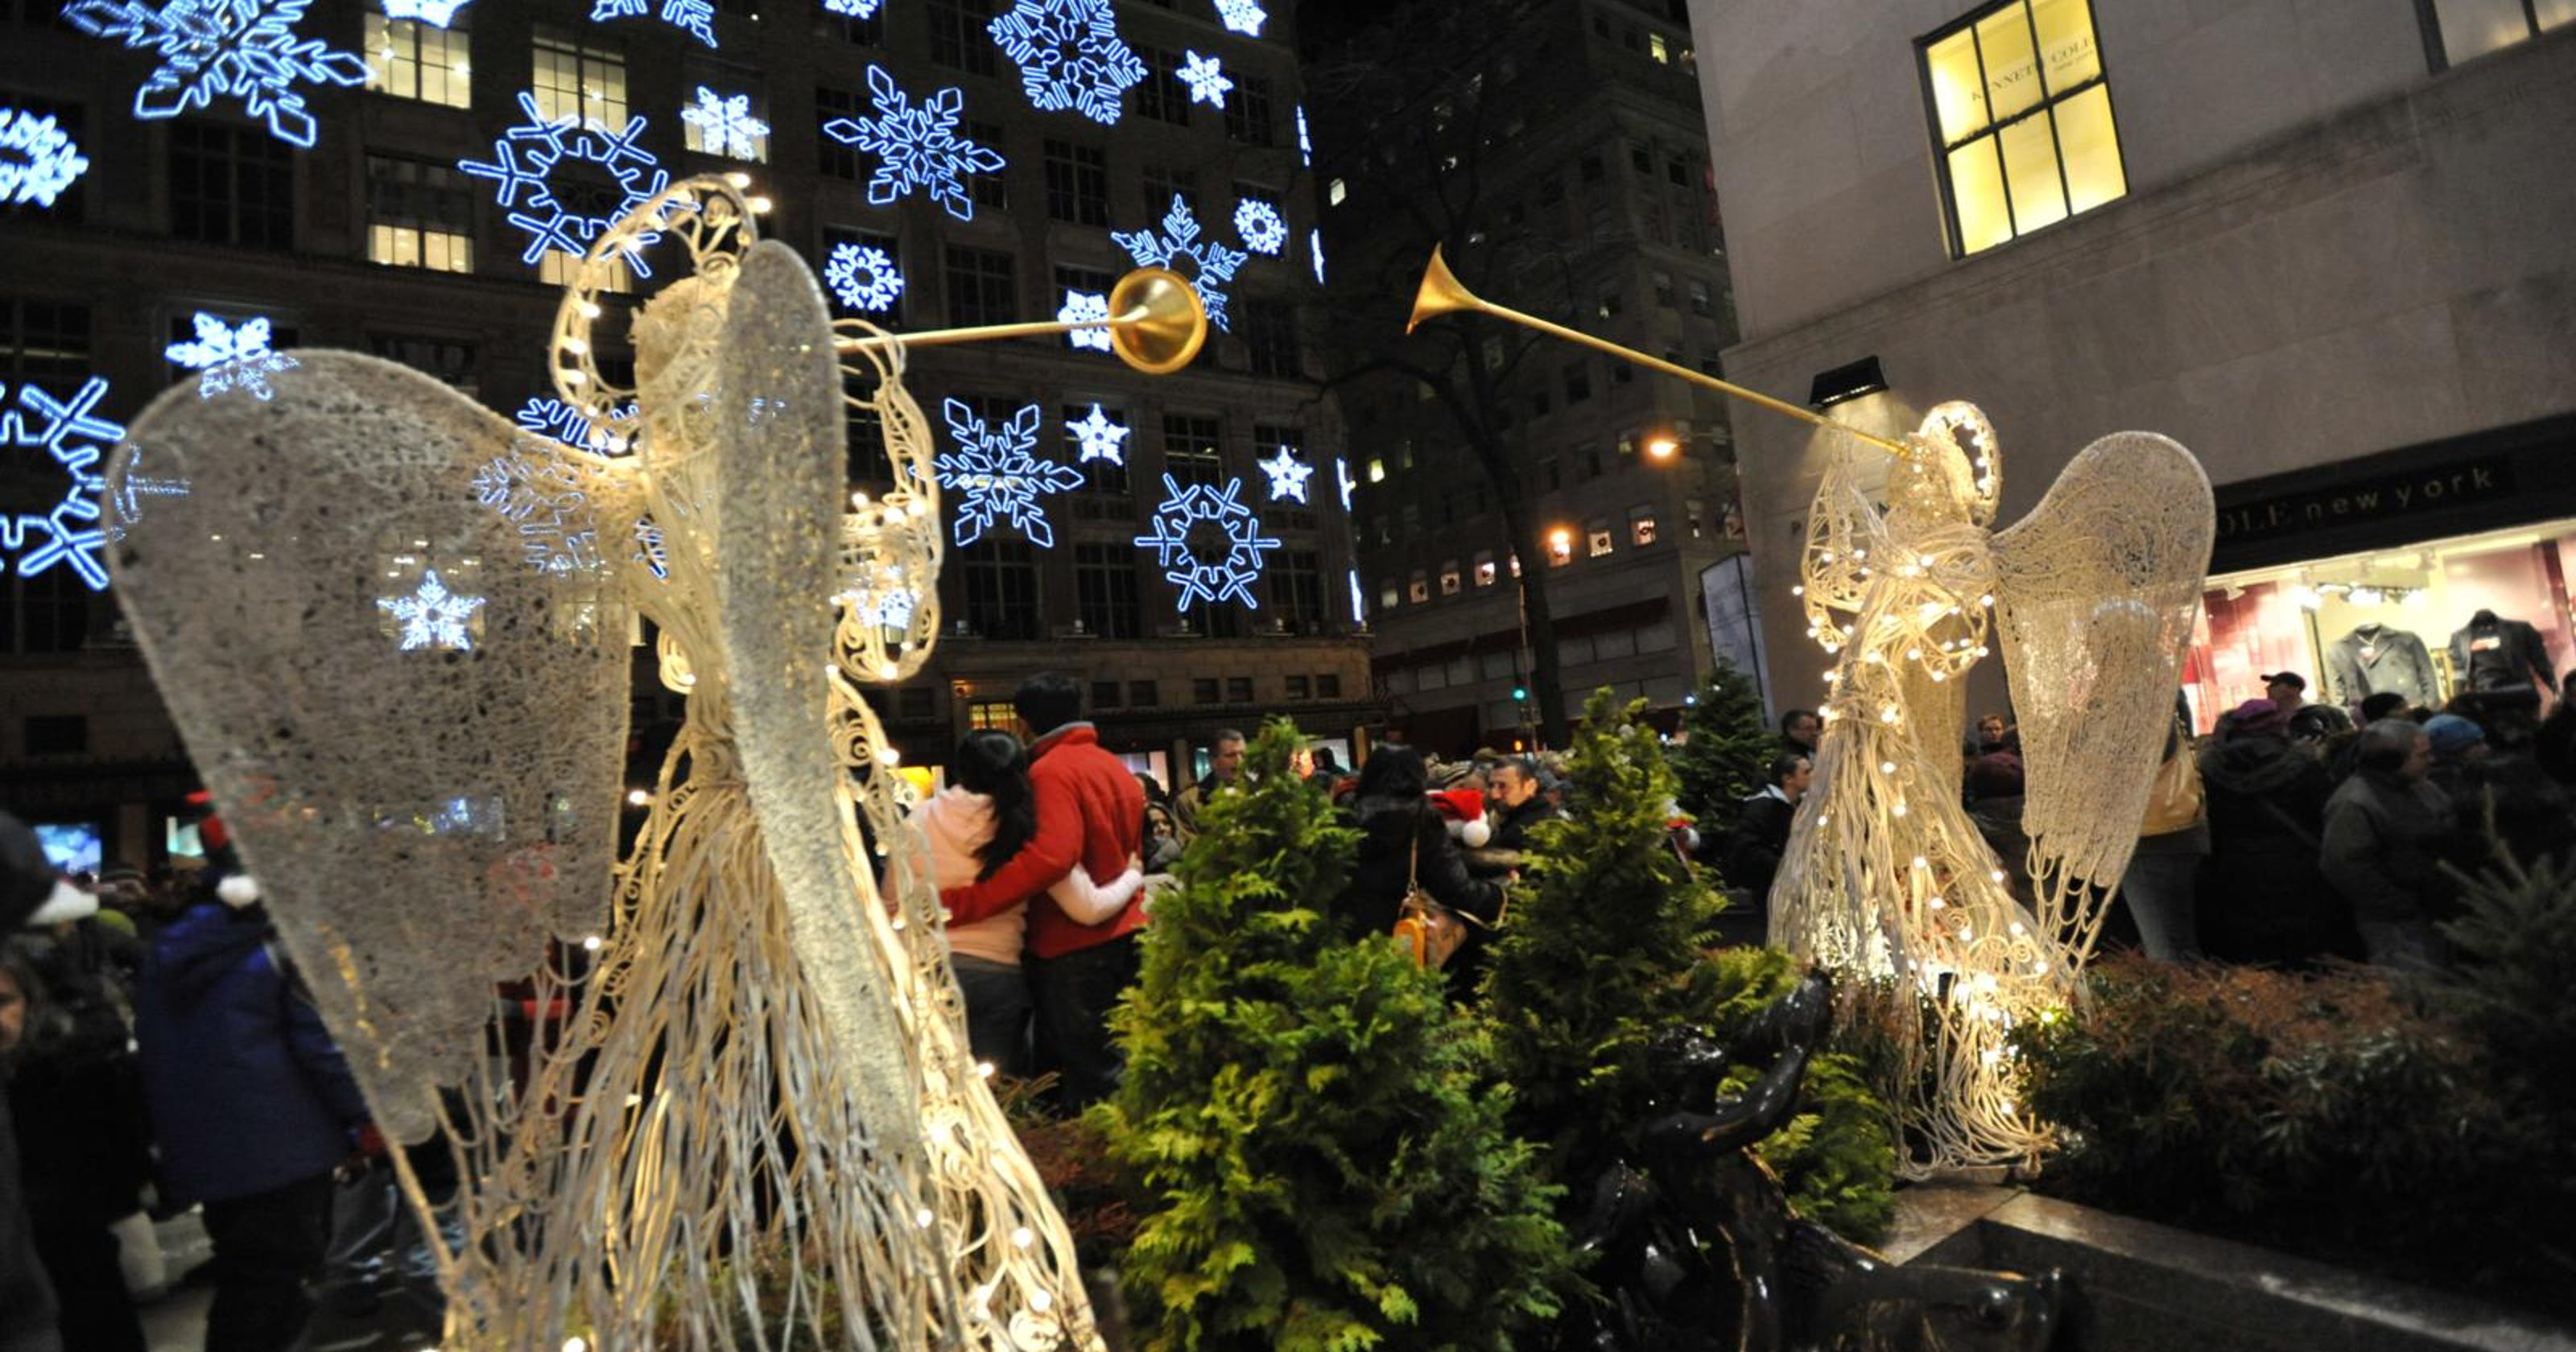 16 ways to spend the holiday season in ny